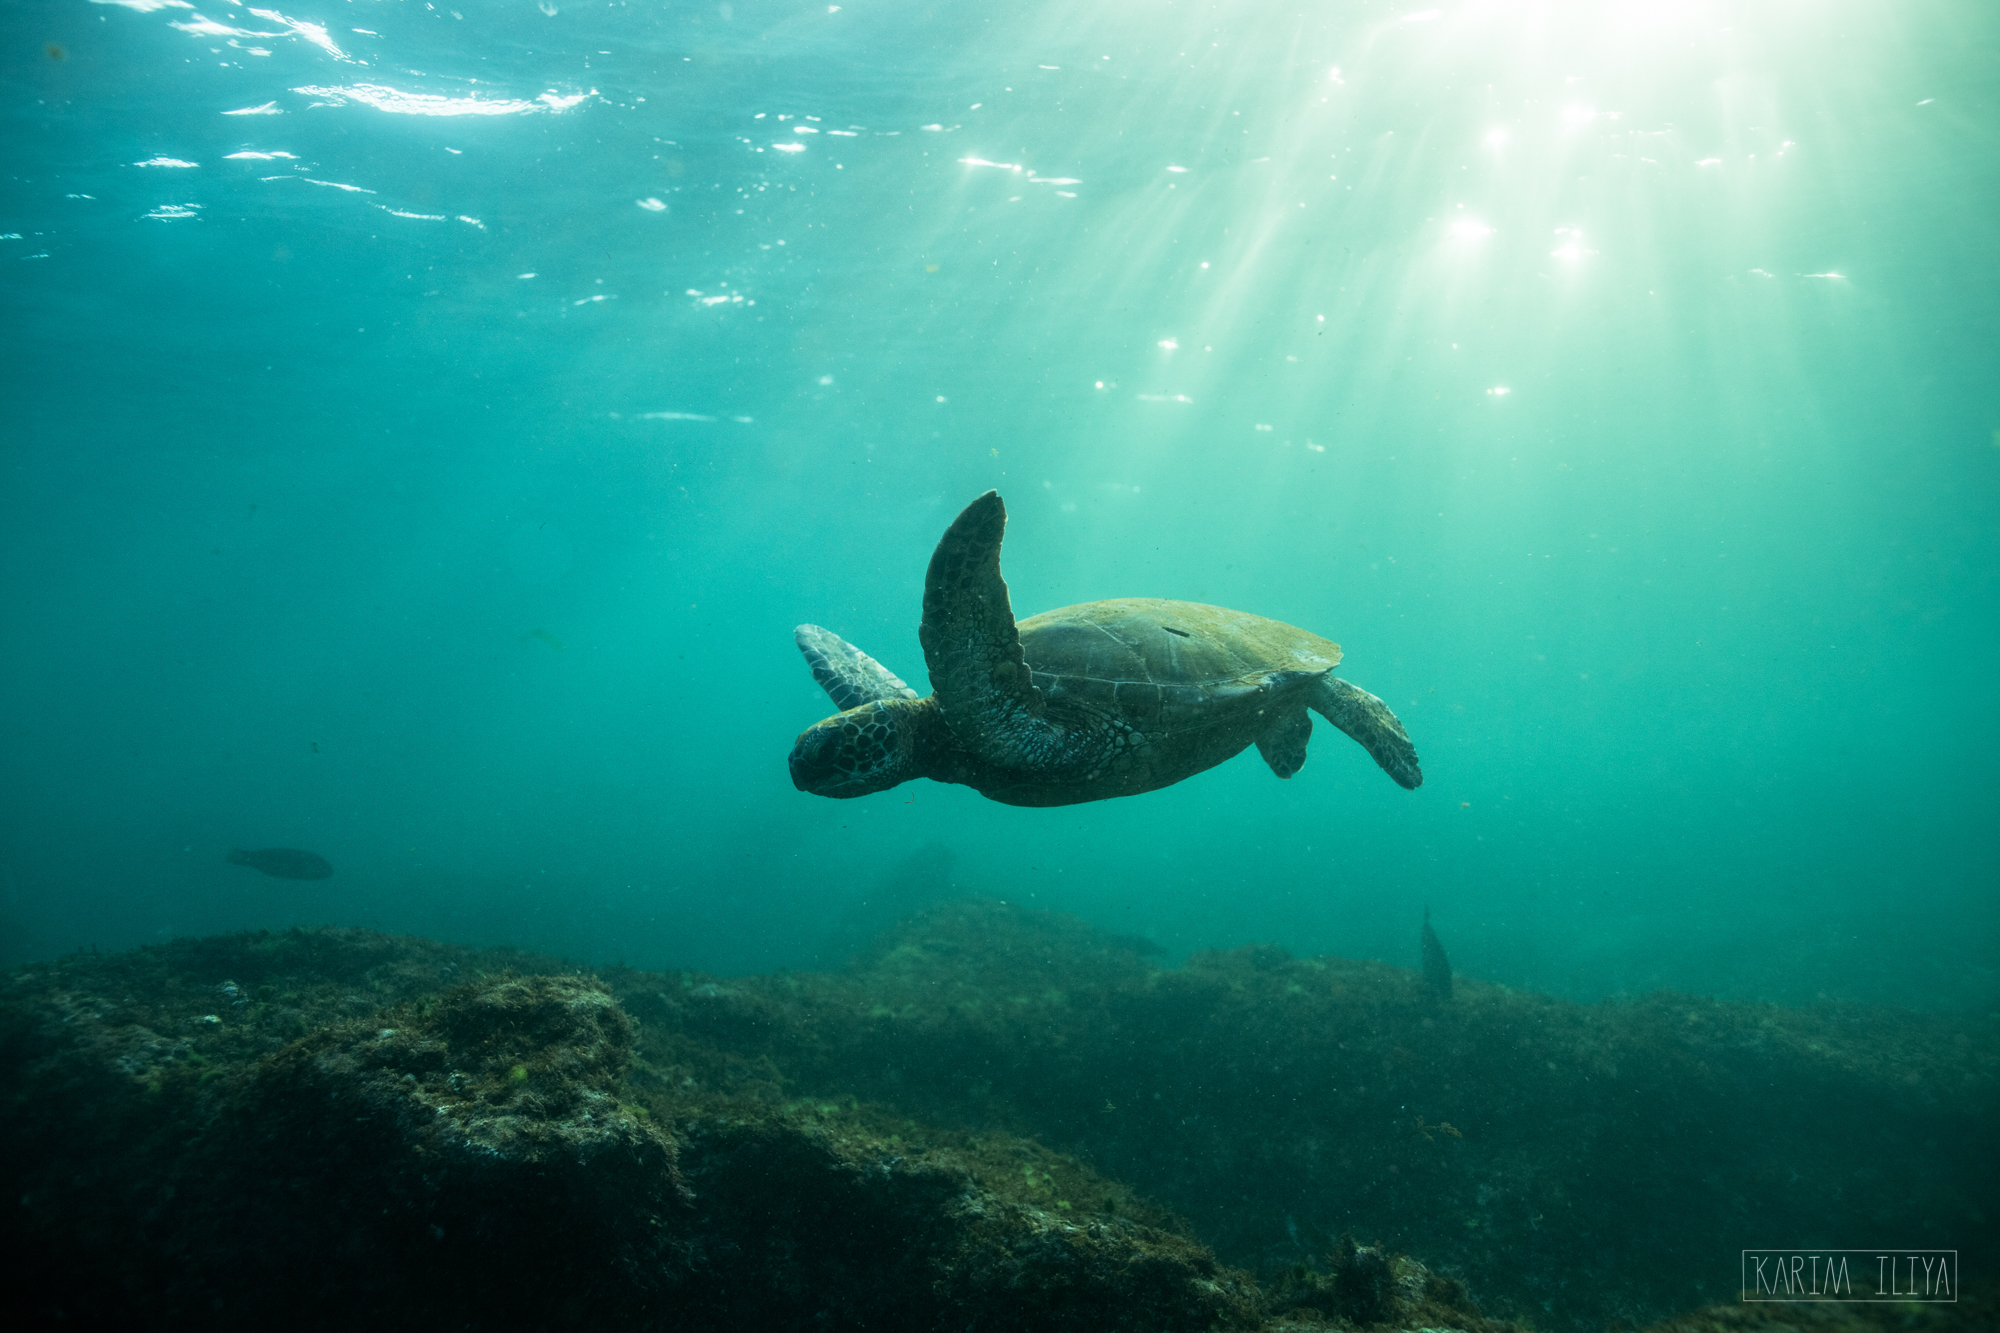 A Hawaiian Green sea turtle cruising through the shallows off Maui, Hawaii.